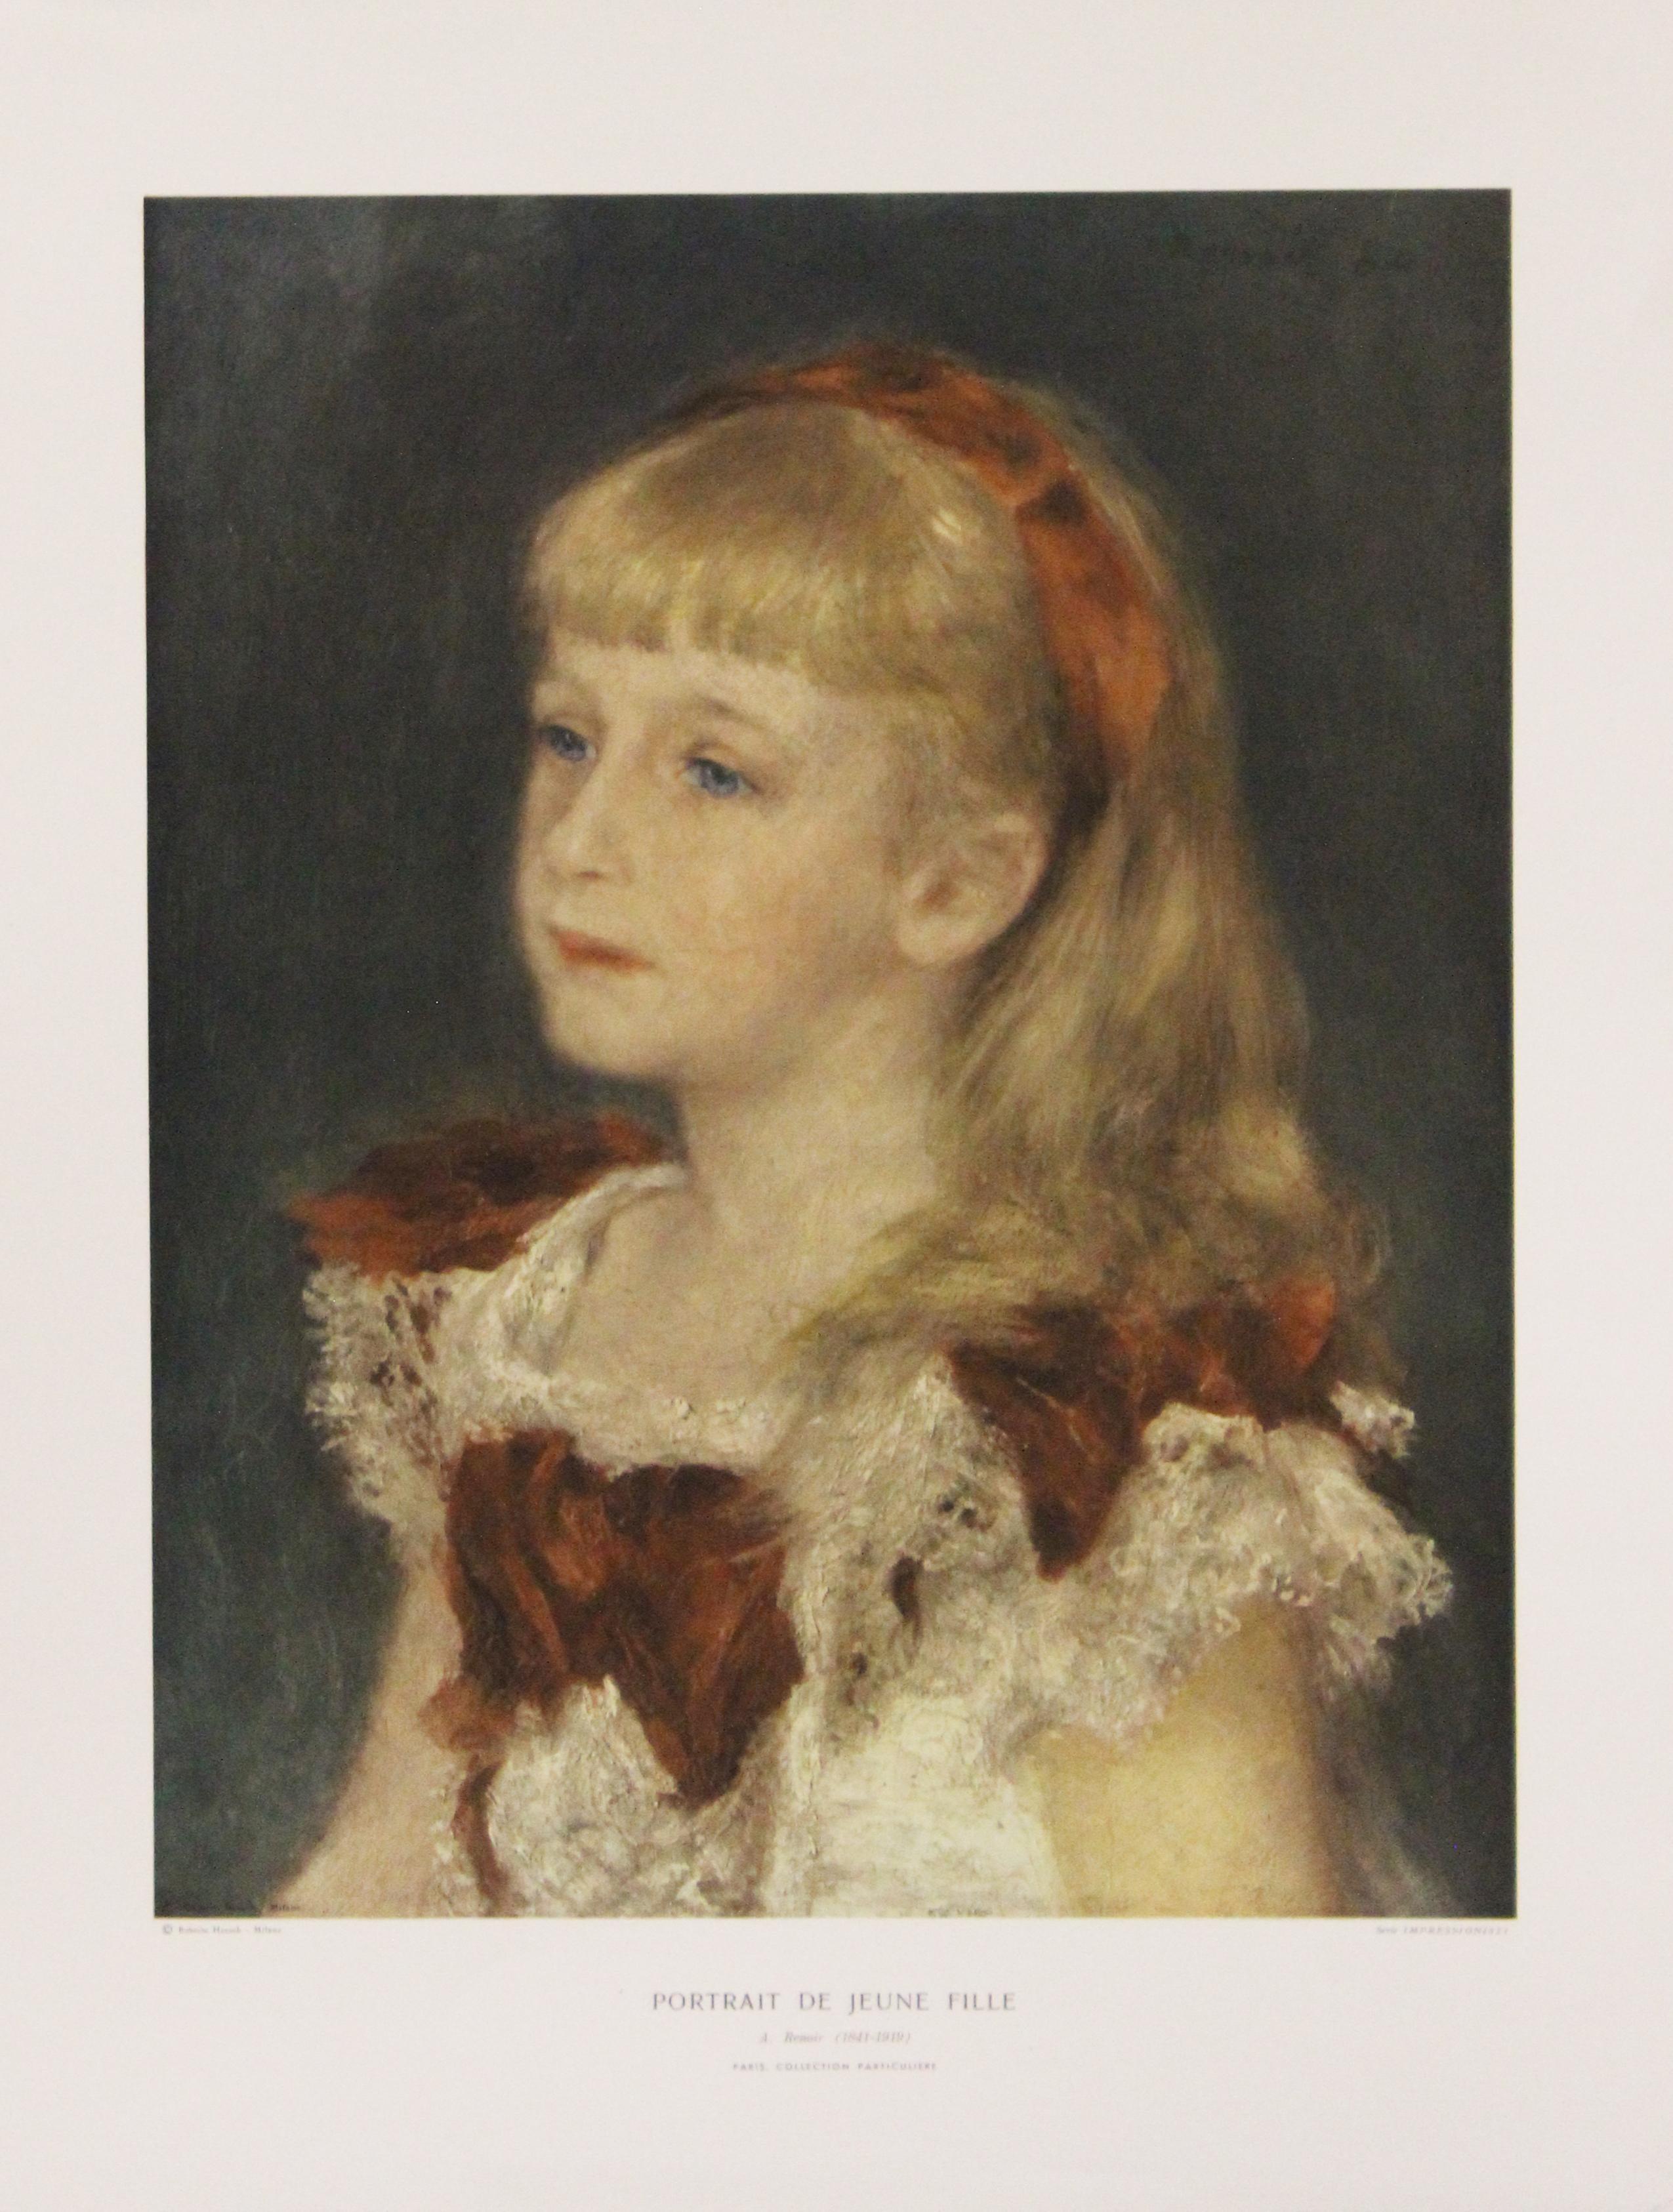 Portrait De Jeune Fille-Poster. Printed in Italy.